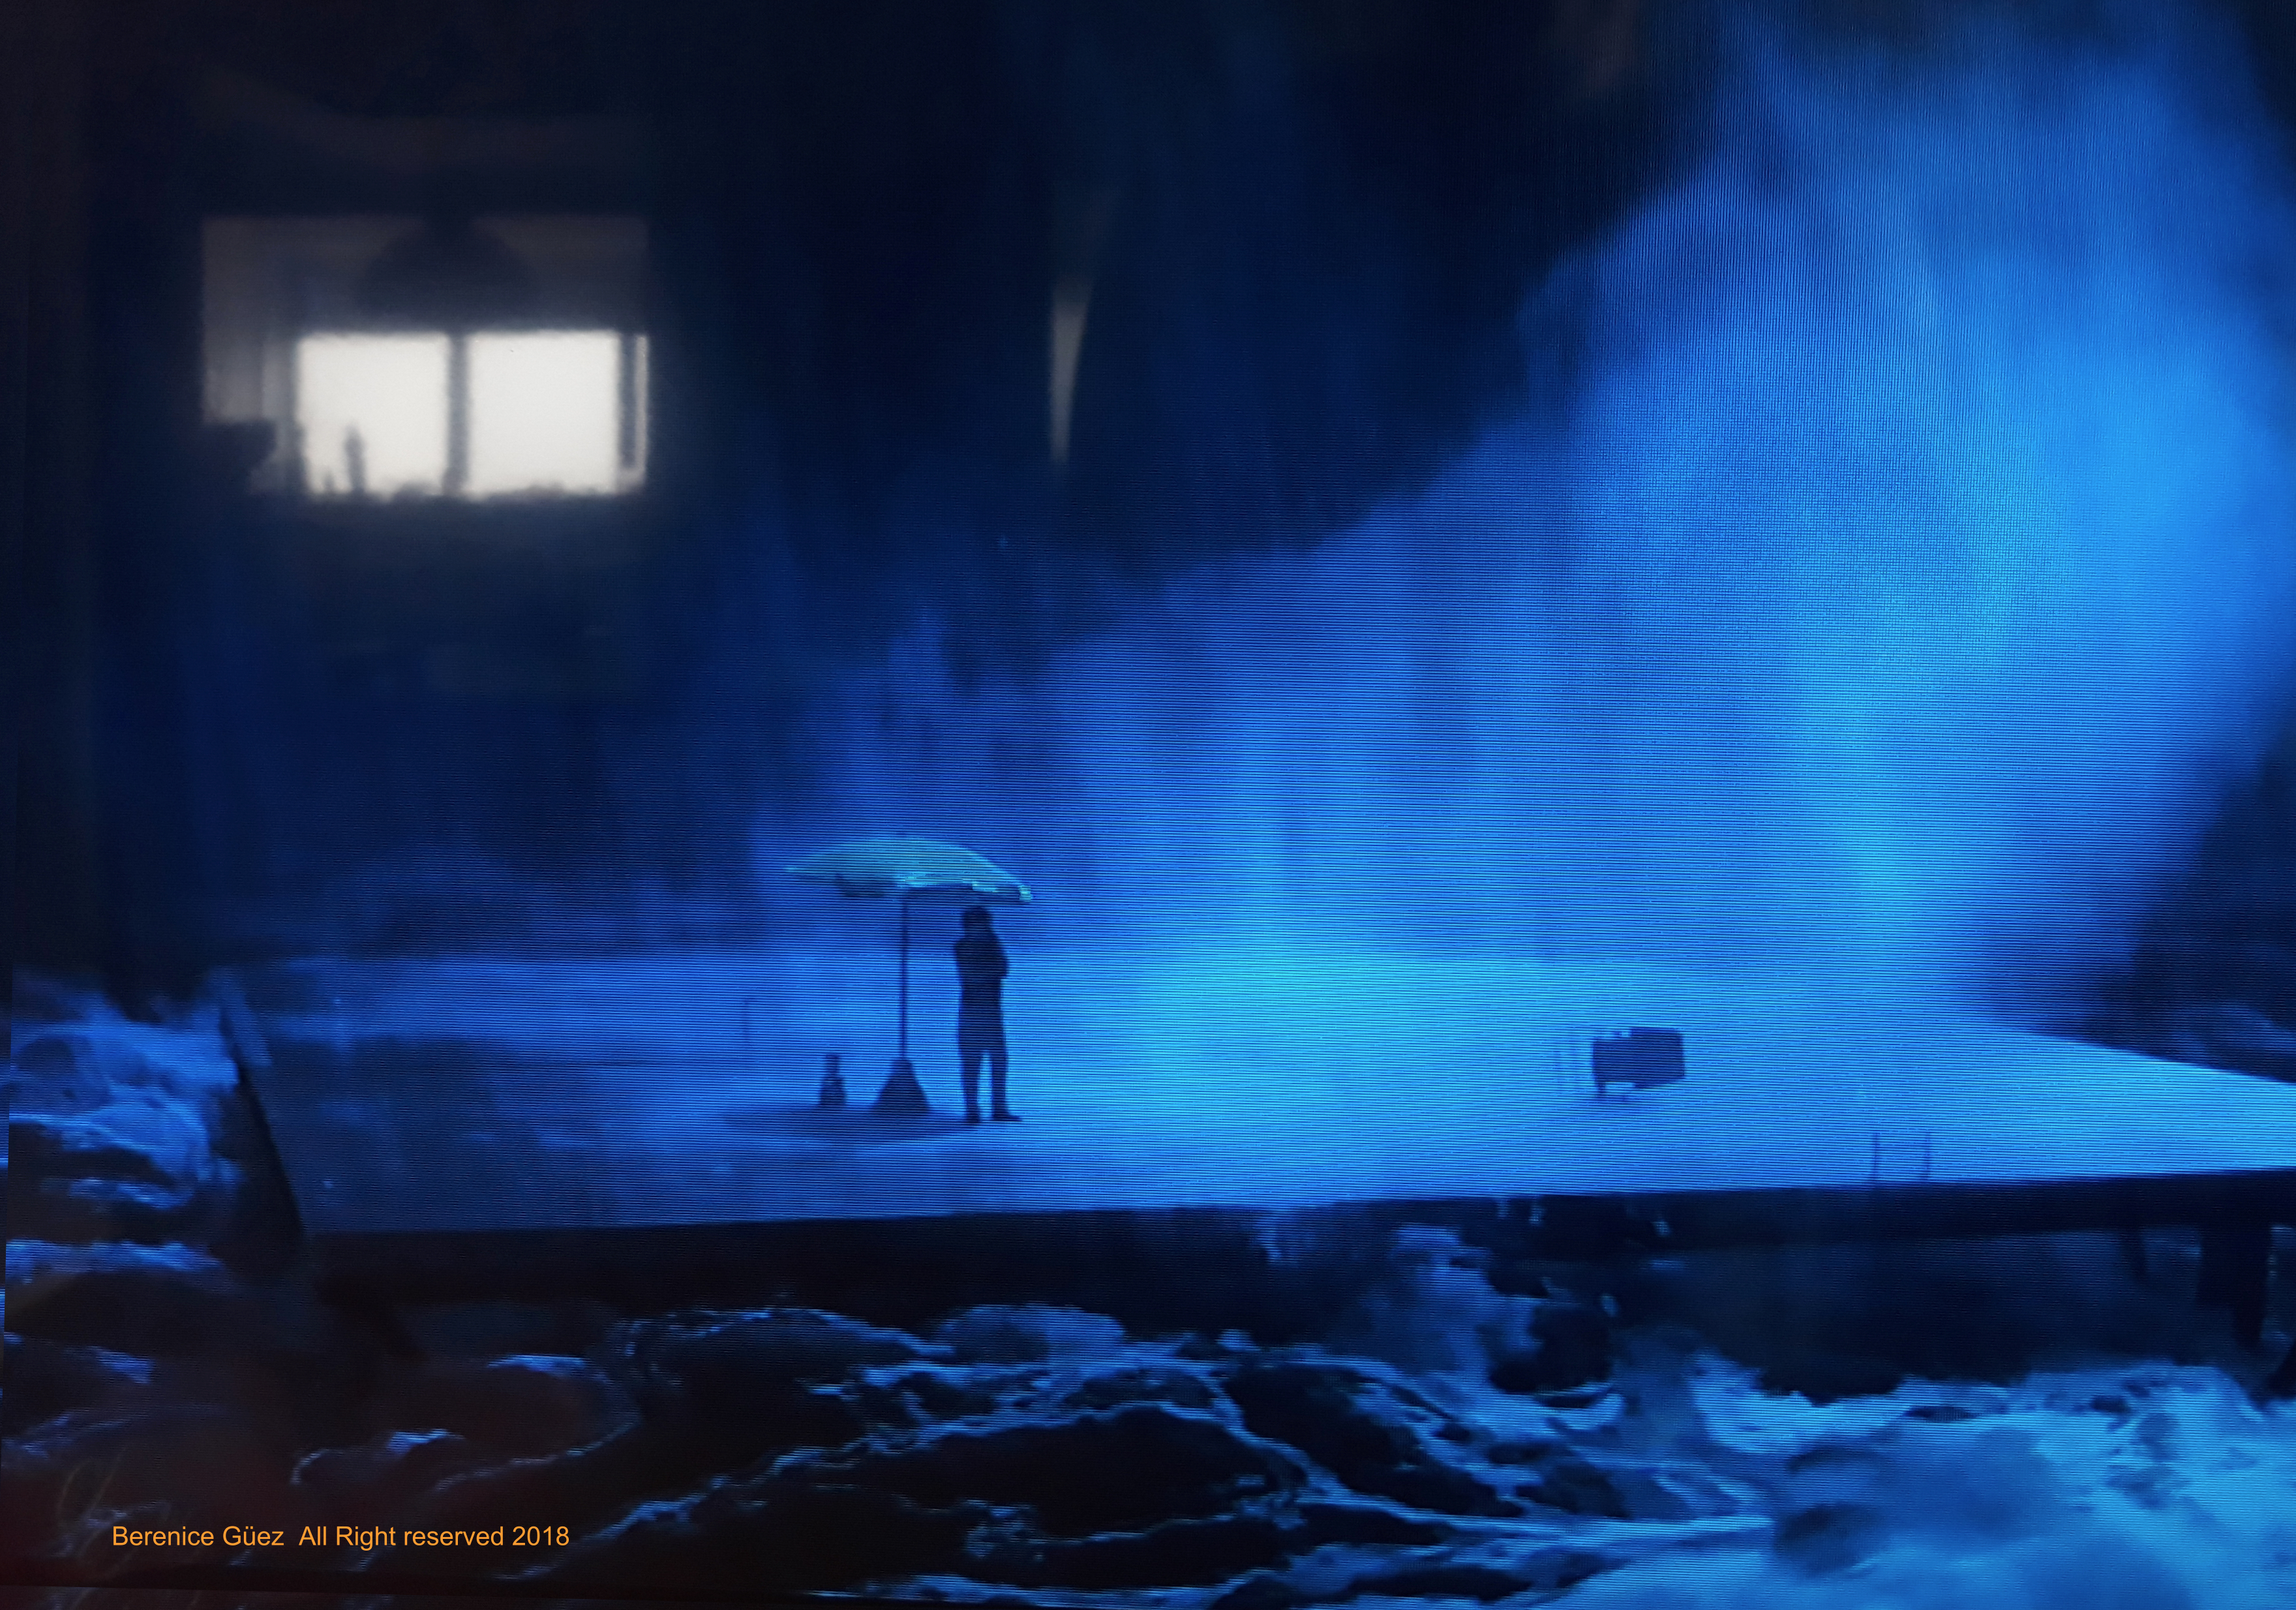 Noturno - fotografia - 2020